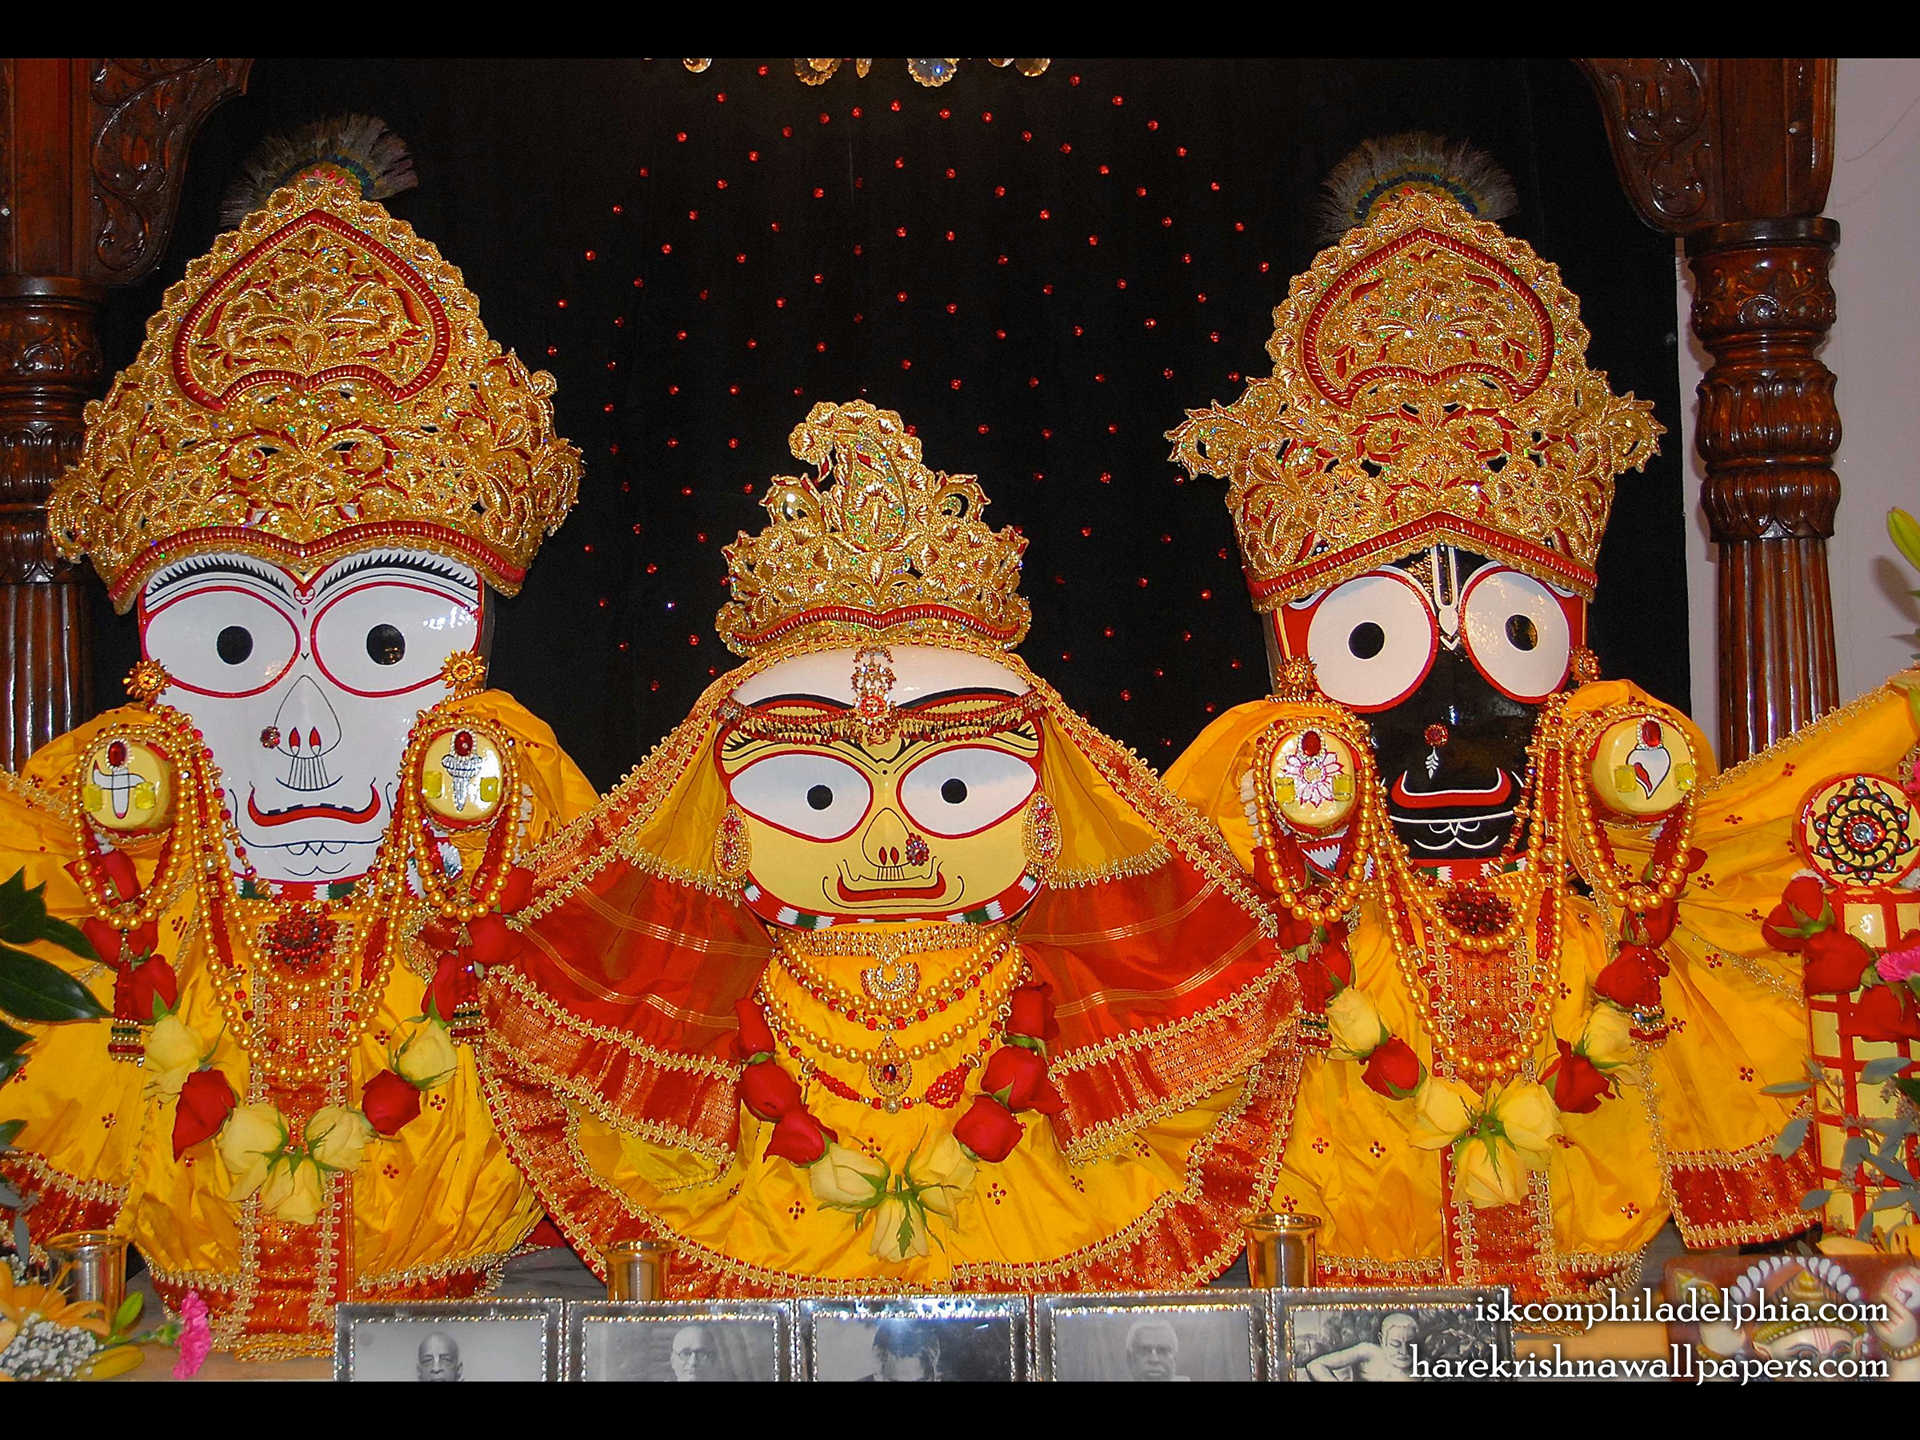 Jagannath Baladeva Subhadra Wallpaper (005) Size 1920x1440 Download